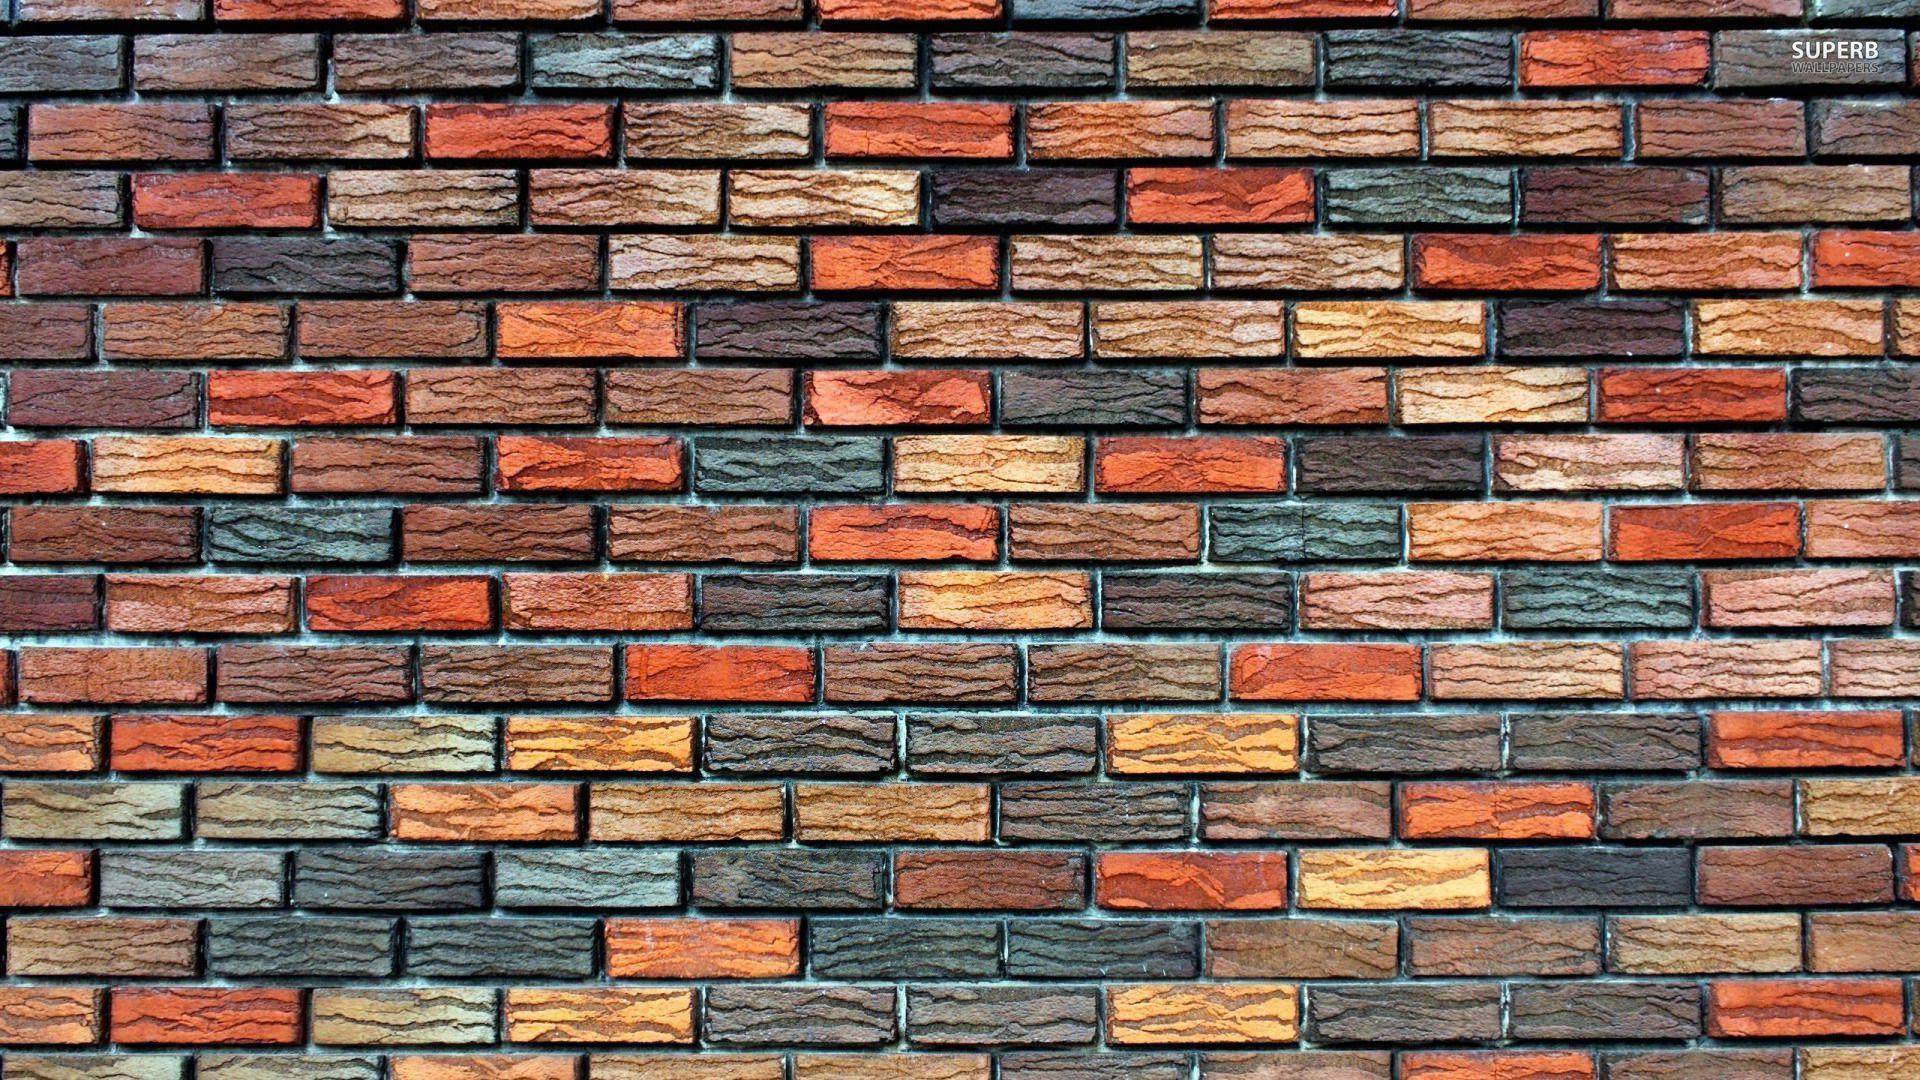 brick wallpaper Pesquisa Google wallpapers Pinterest